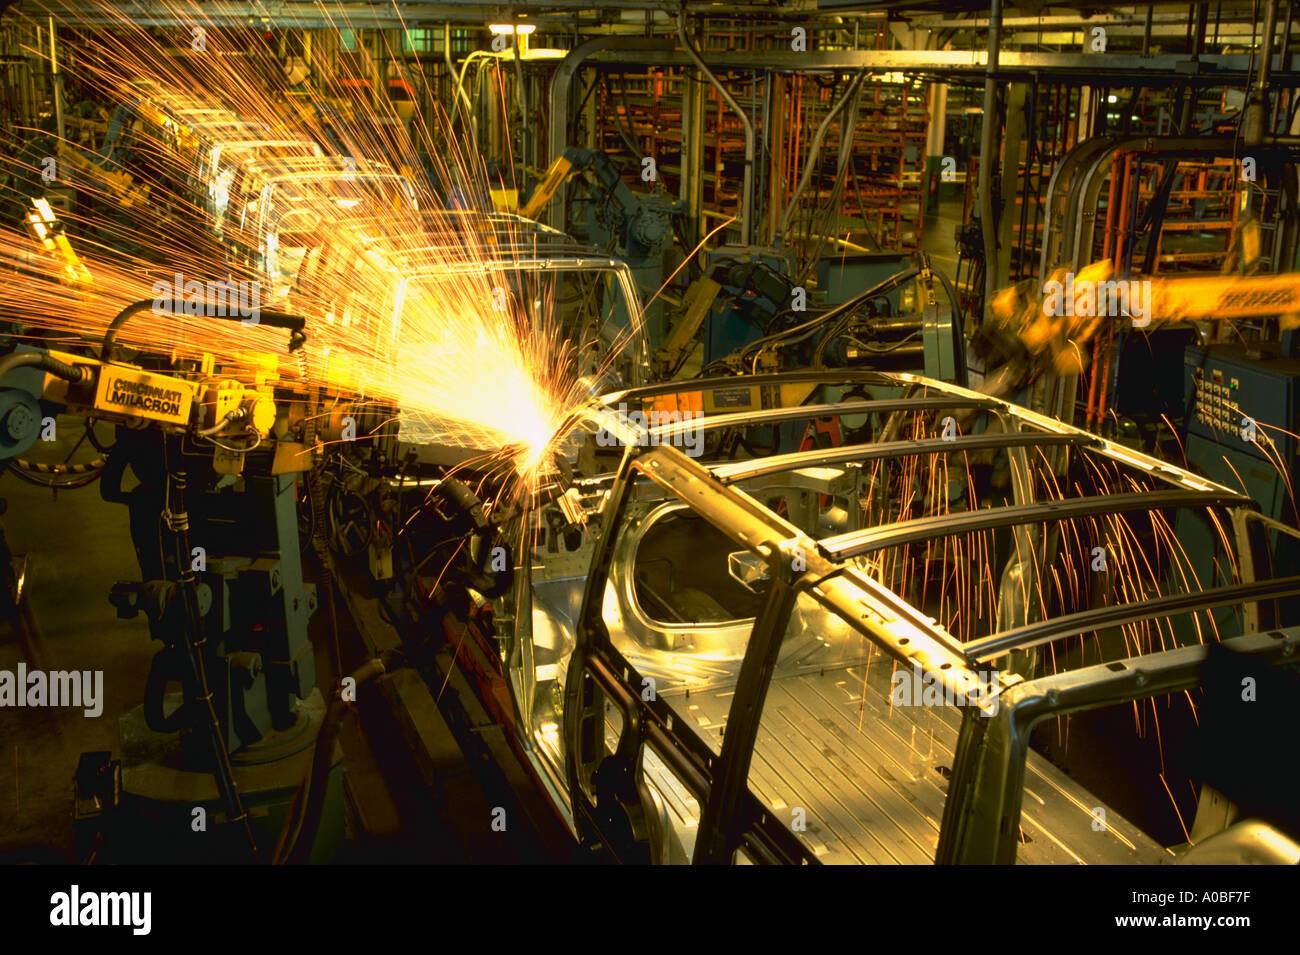 Robots weld van bodies at General Motors plant in Baltimore MD DA 4037 - Stock Image